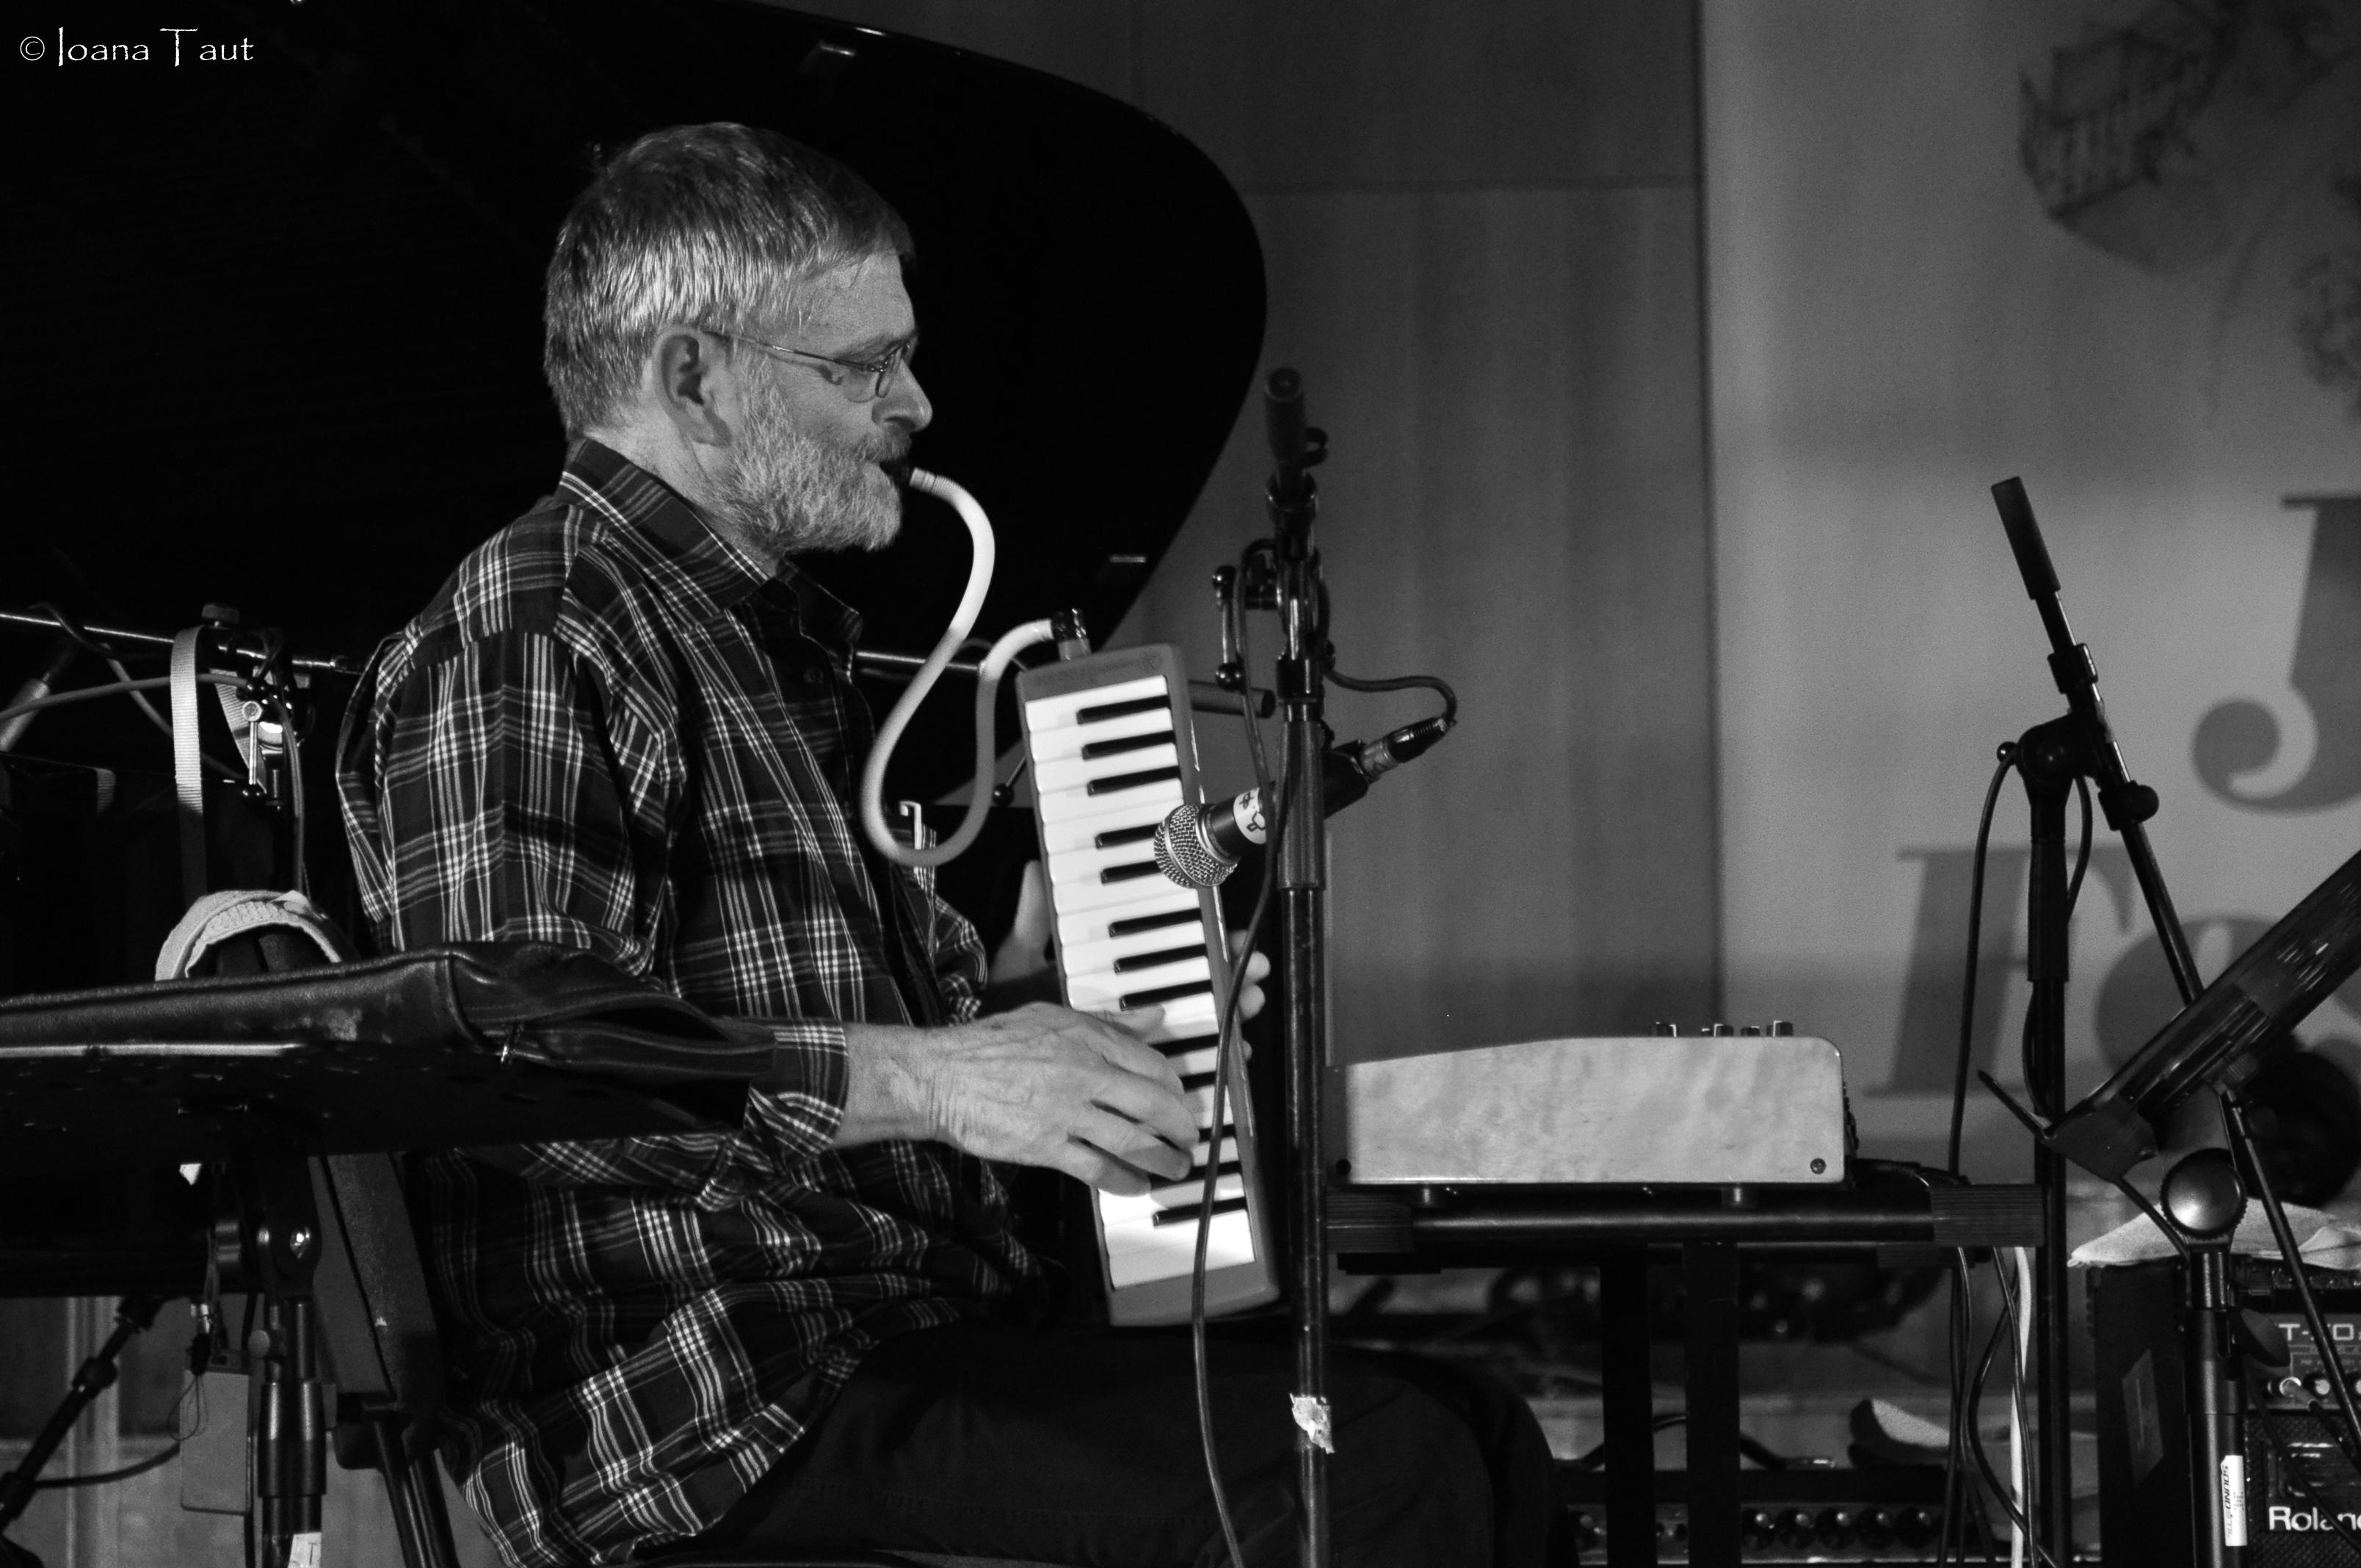 The New Dimension (Romania) @ Timisoara Jazz Festival: